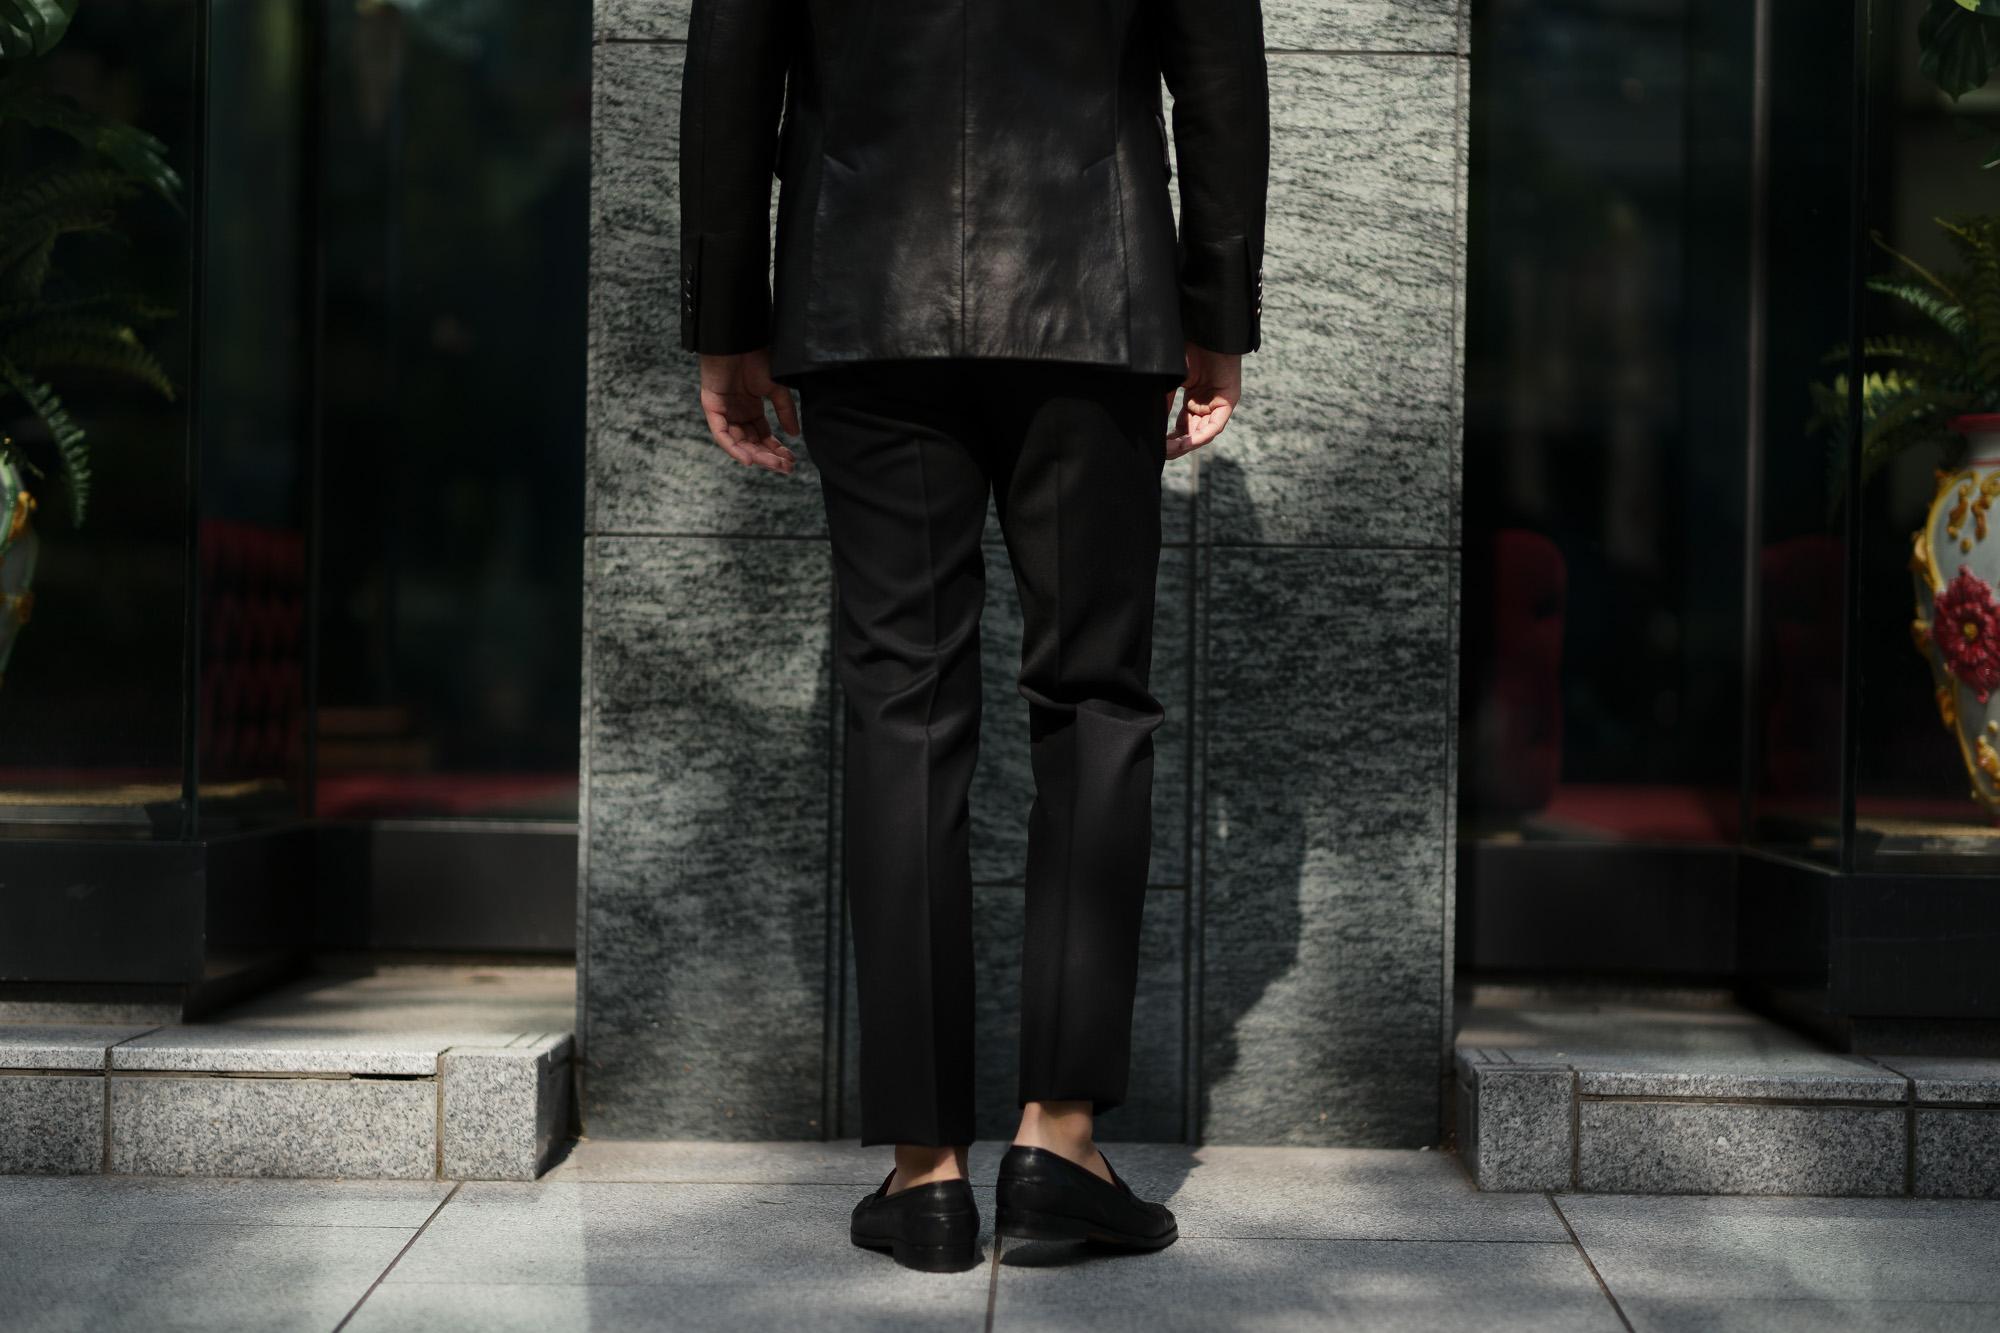 INCOTEX (インコテックス) N35 SLIM FIT (1NT035) SUPER 100'S WORSTED FLANNEL フランネル ウール スラックス BLACK (ブラック・990) 2019 秋冬 【ご予約受付中】 愛知 名古屋 altoediritto アルトエデリット